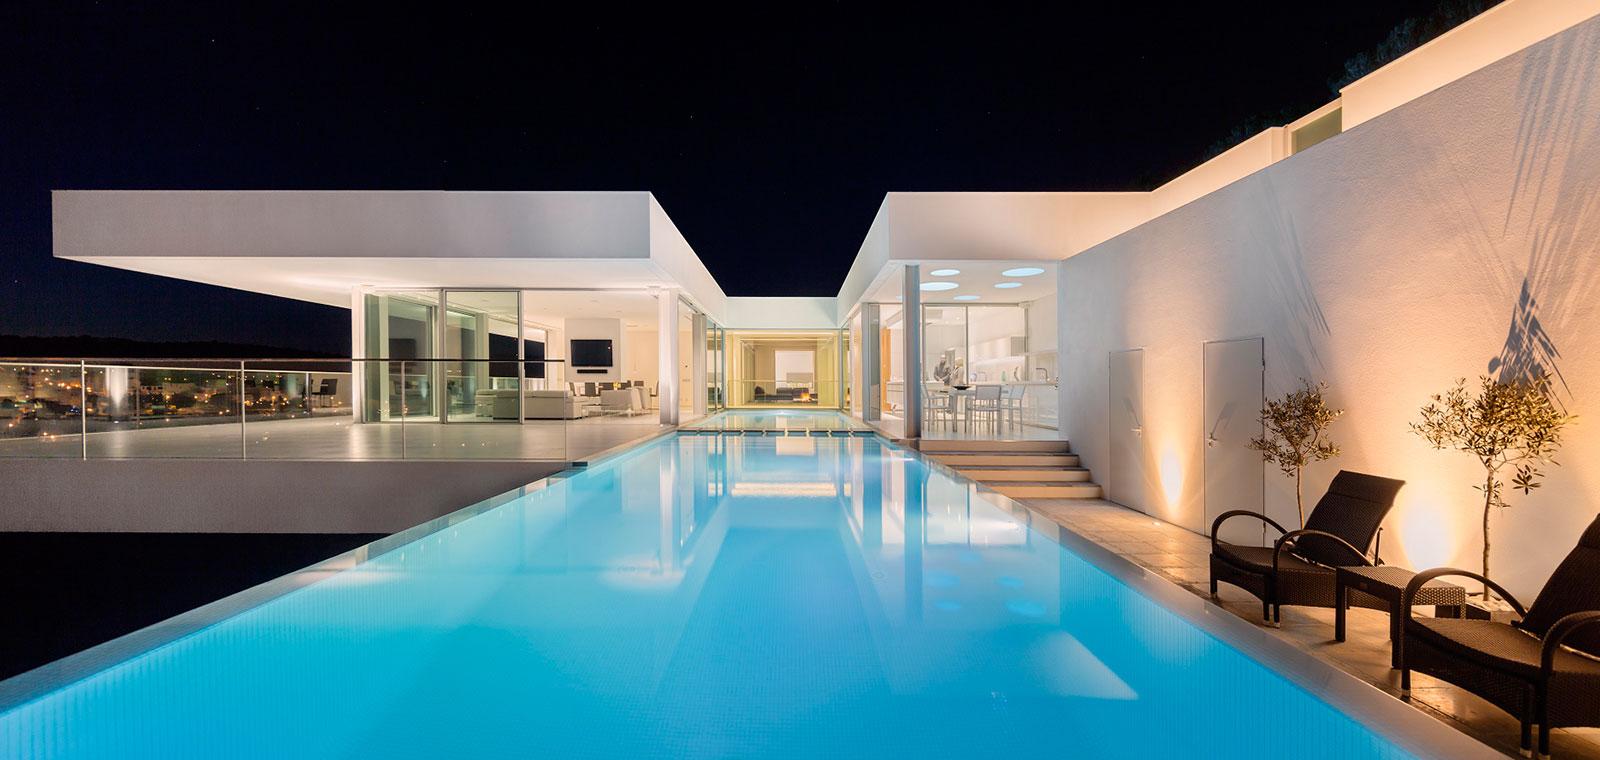 Villa Escarpa stunning portuguese house by Mario Martins Atelier